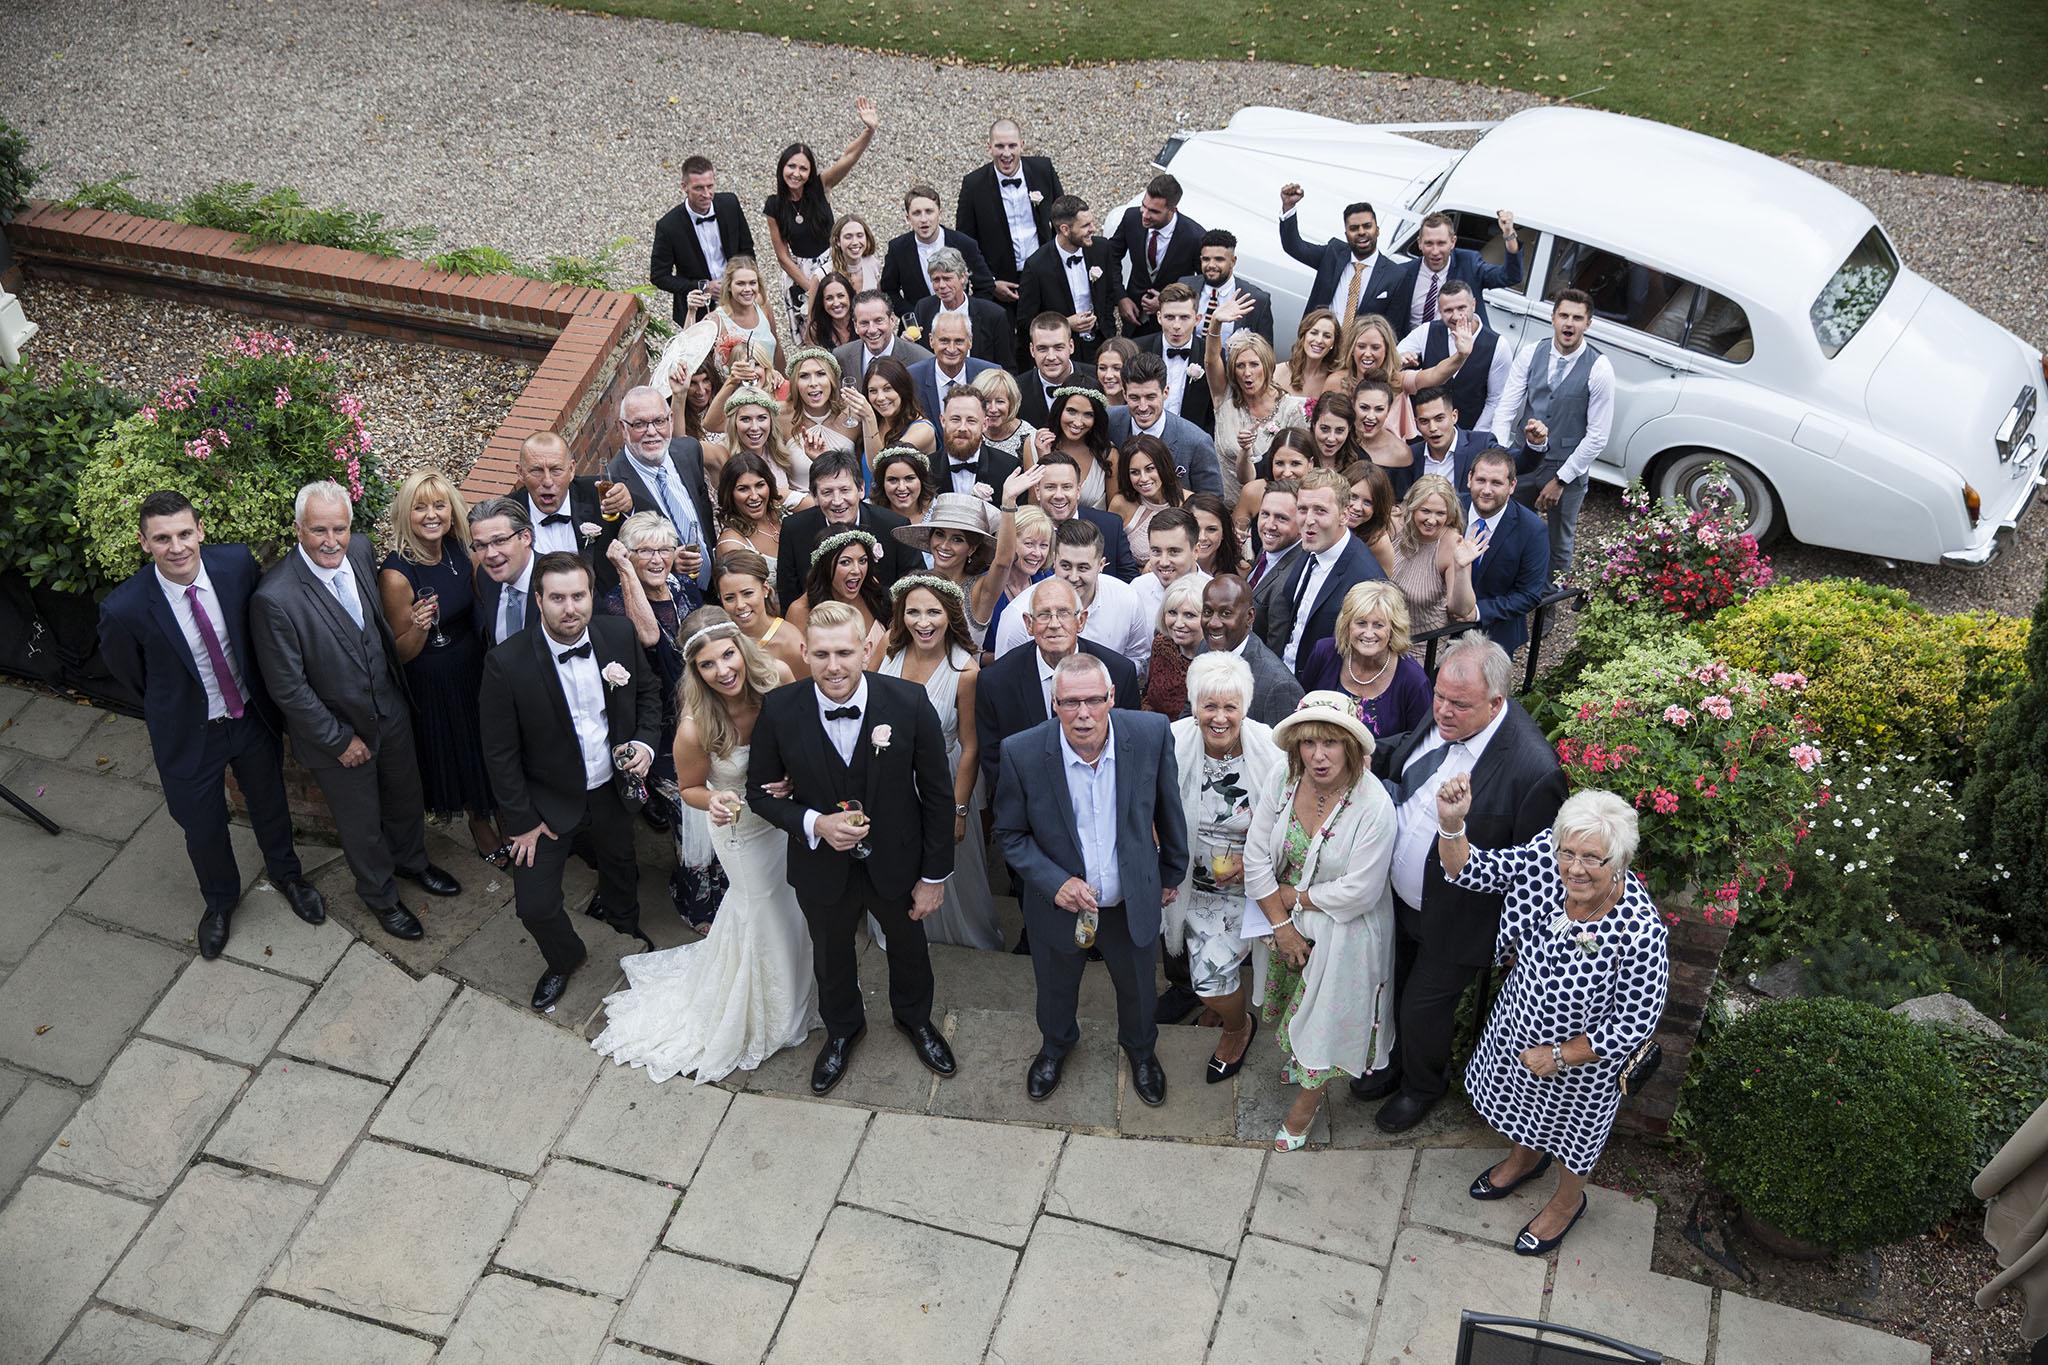 elizabethgphotography_kingslangley_hertfordshire_fineart_wedding_stmichaelsmanor_hotel_stalbans_luciejack_35.jpg